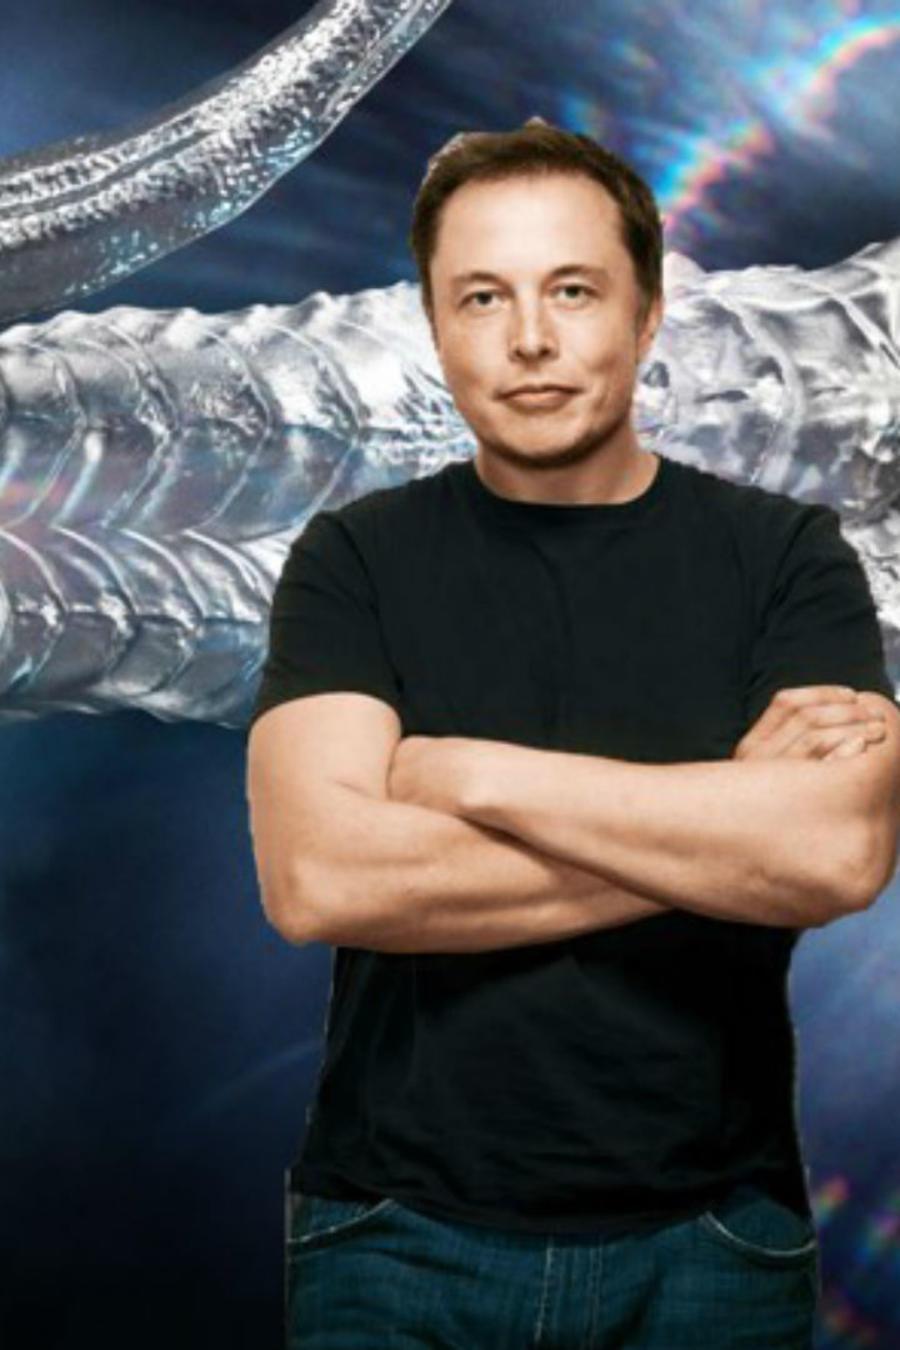 Elon Musk junto a un dragón